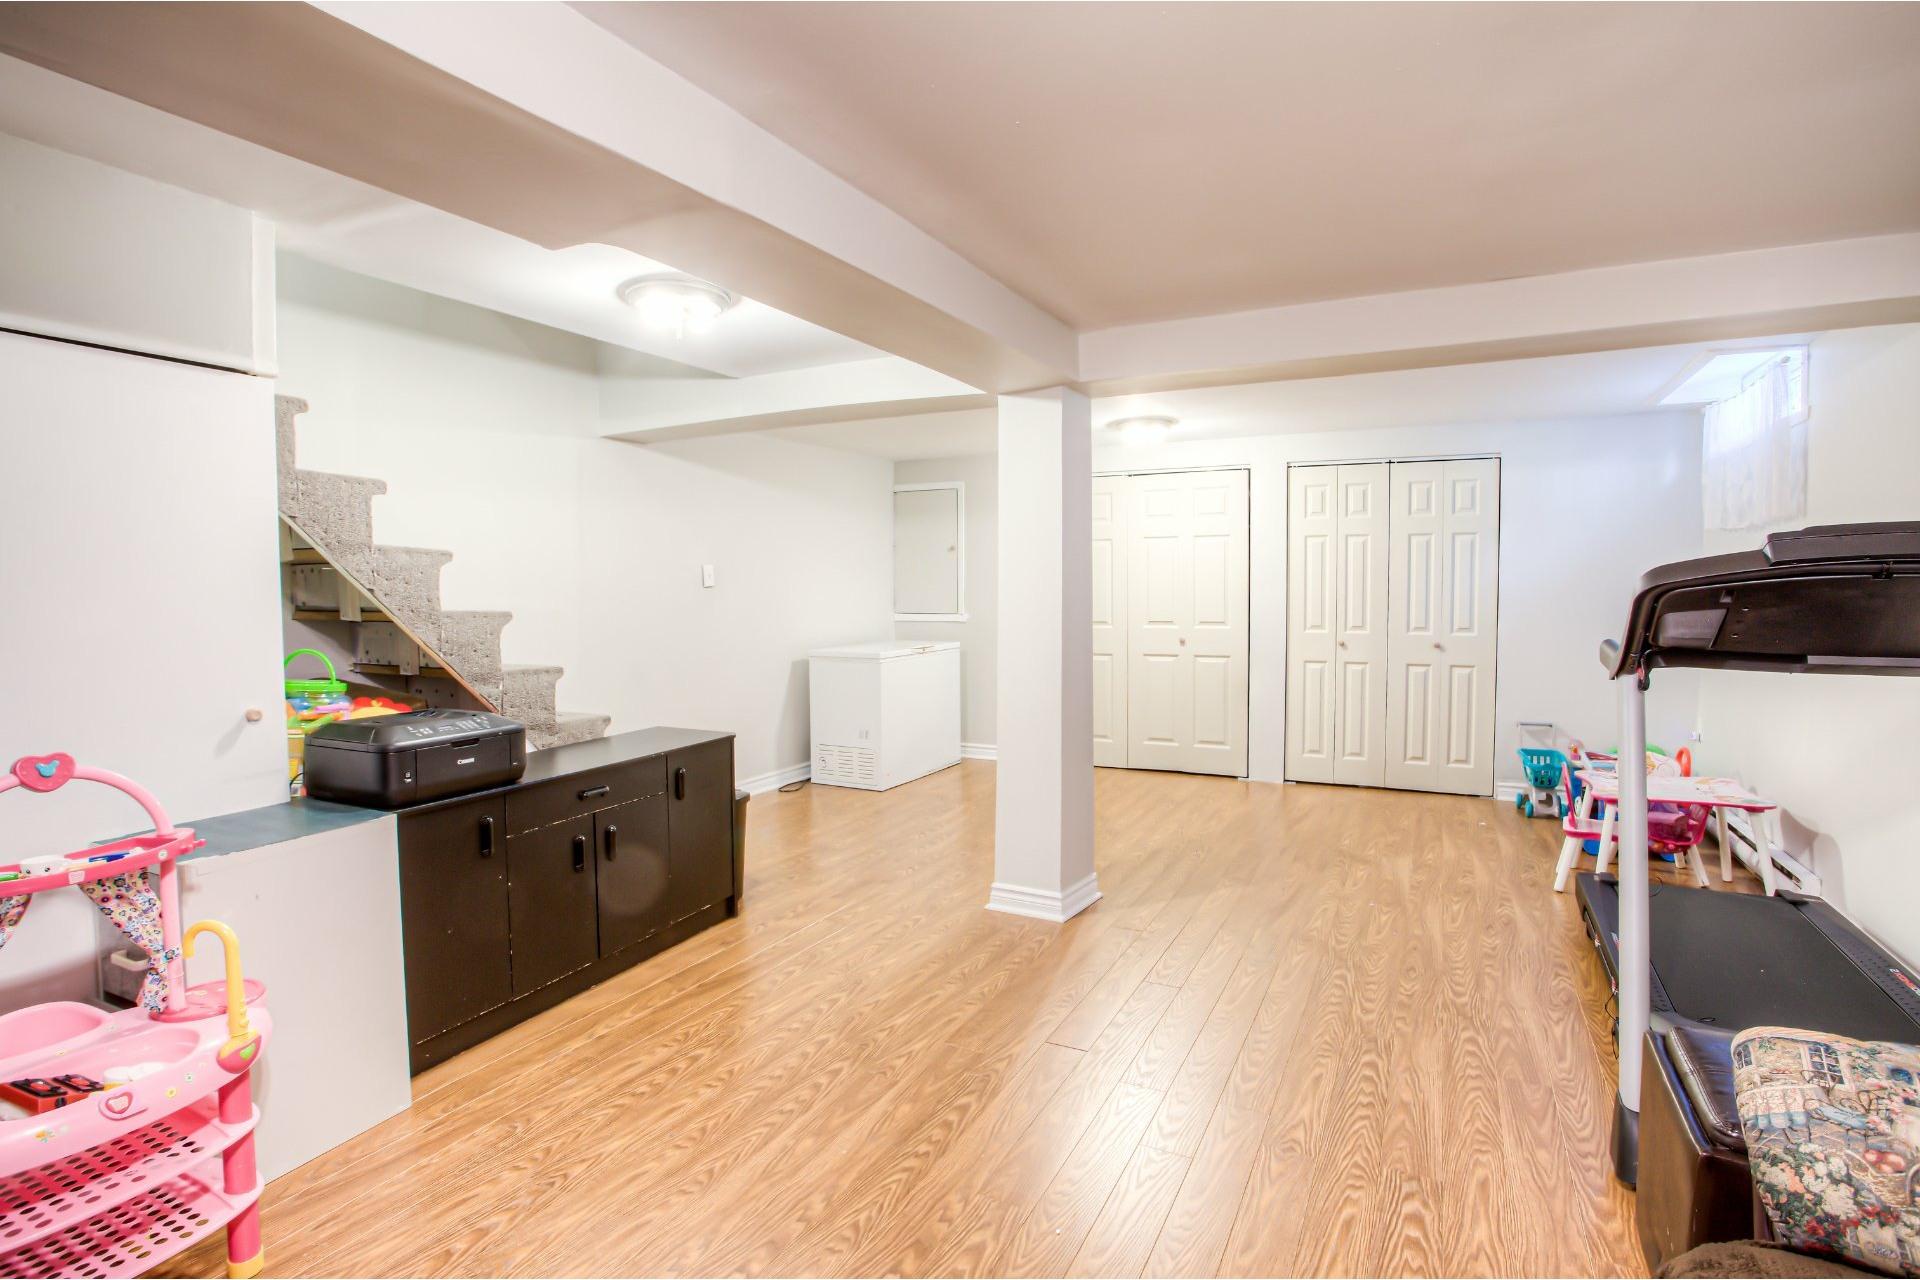 image 22 - House For rent Pierrefonds-Roxboro Montréal  - 9 rooms